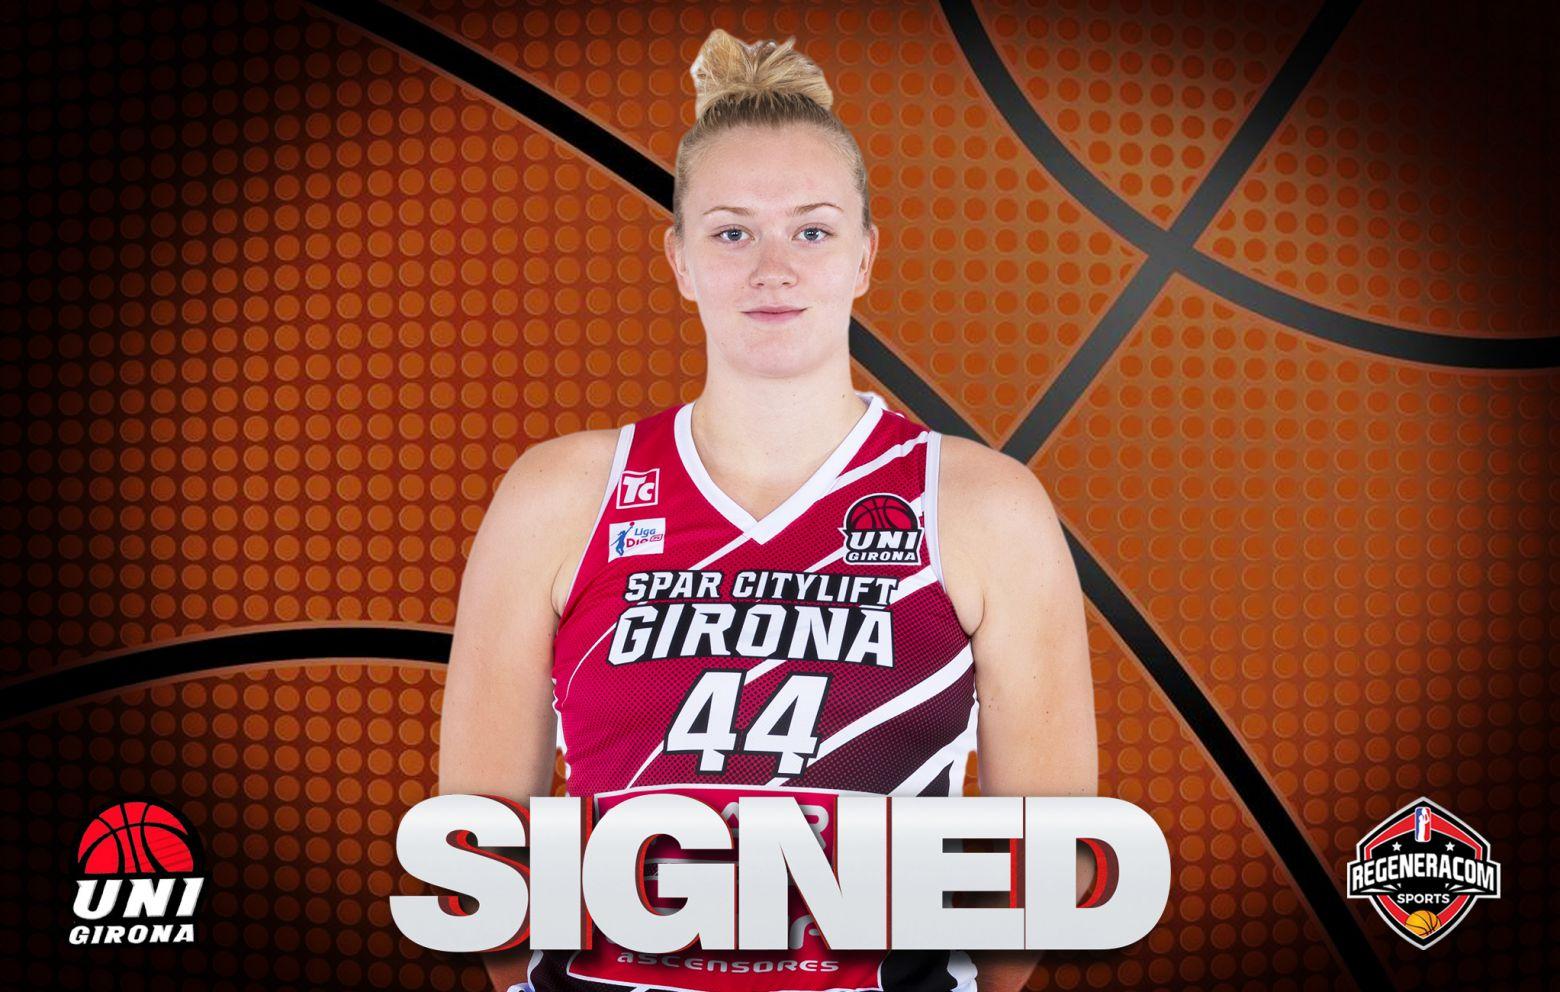 JULIA REISINGEROVA has signed in Spain with Uni Girona